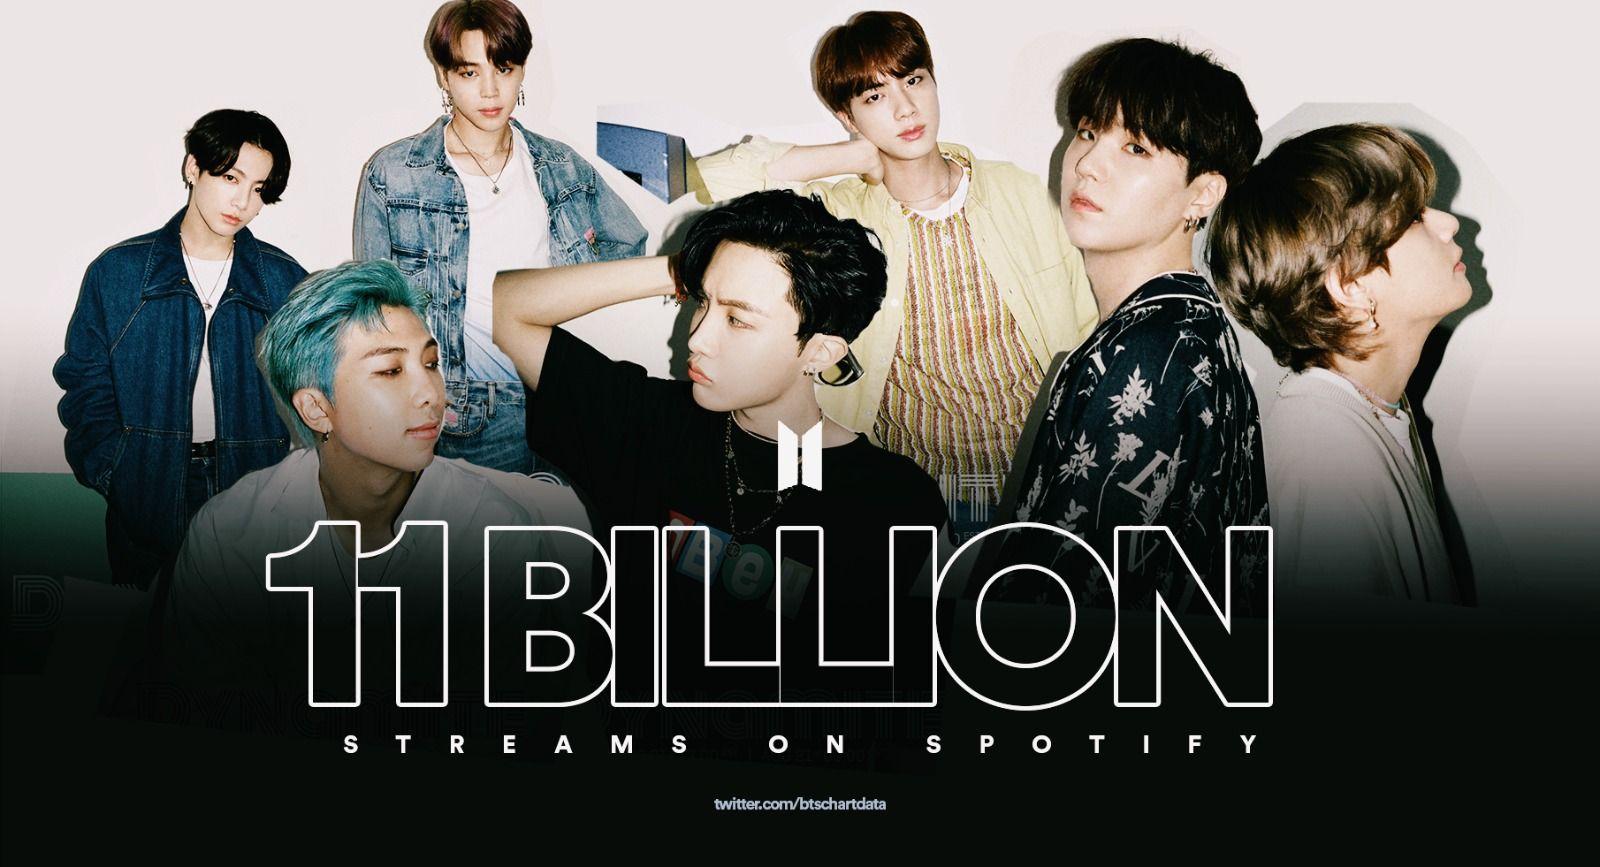 Bts Has Surpassed 11 Billion Total Streams On Spotify So Far Bts Billboard Spotify Bts